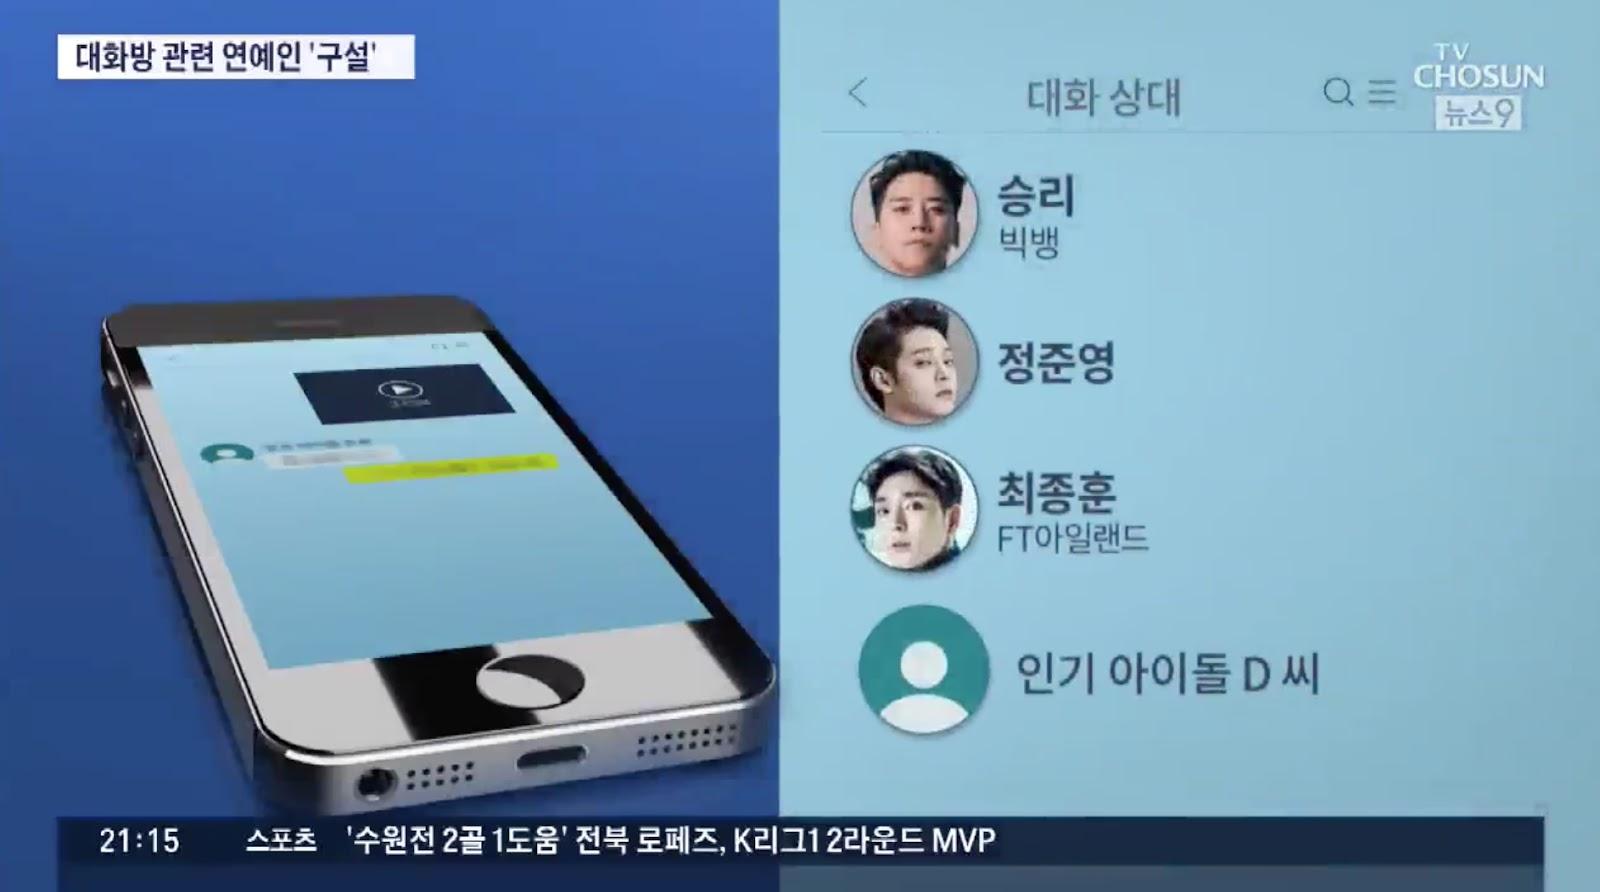 seungri jung joon young jonghoon 3